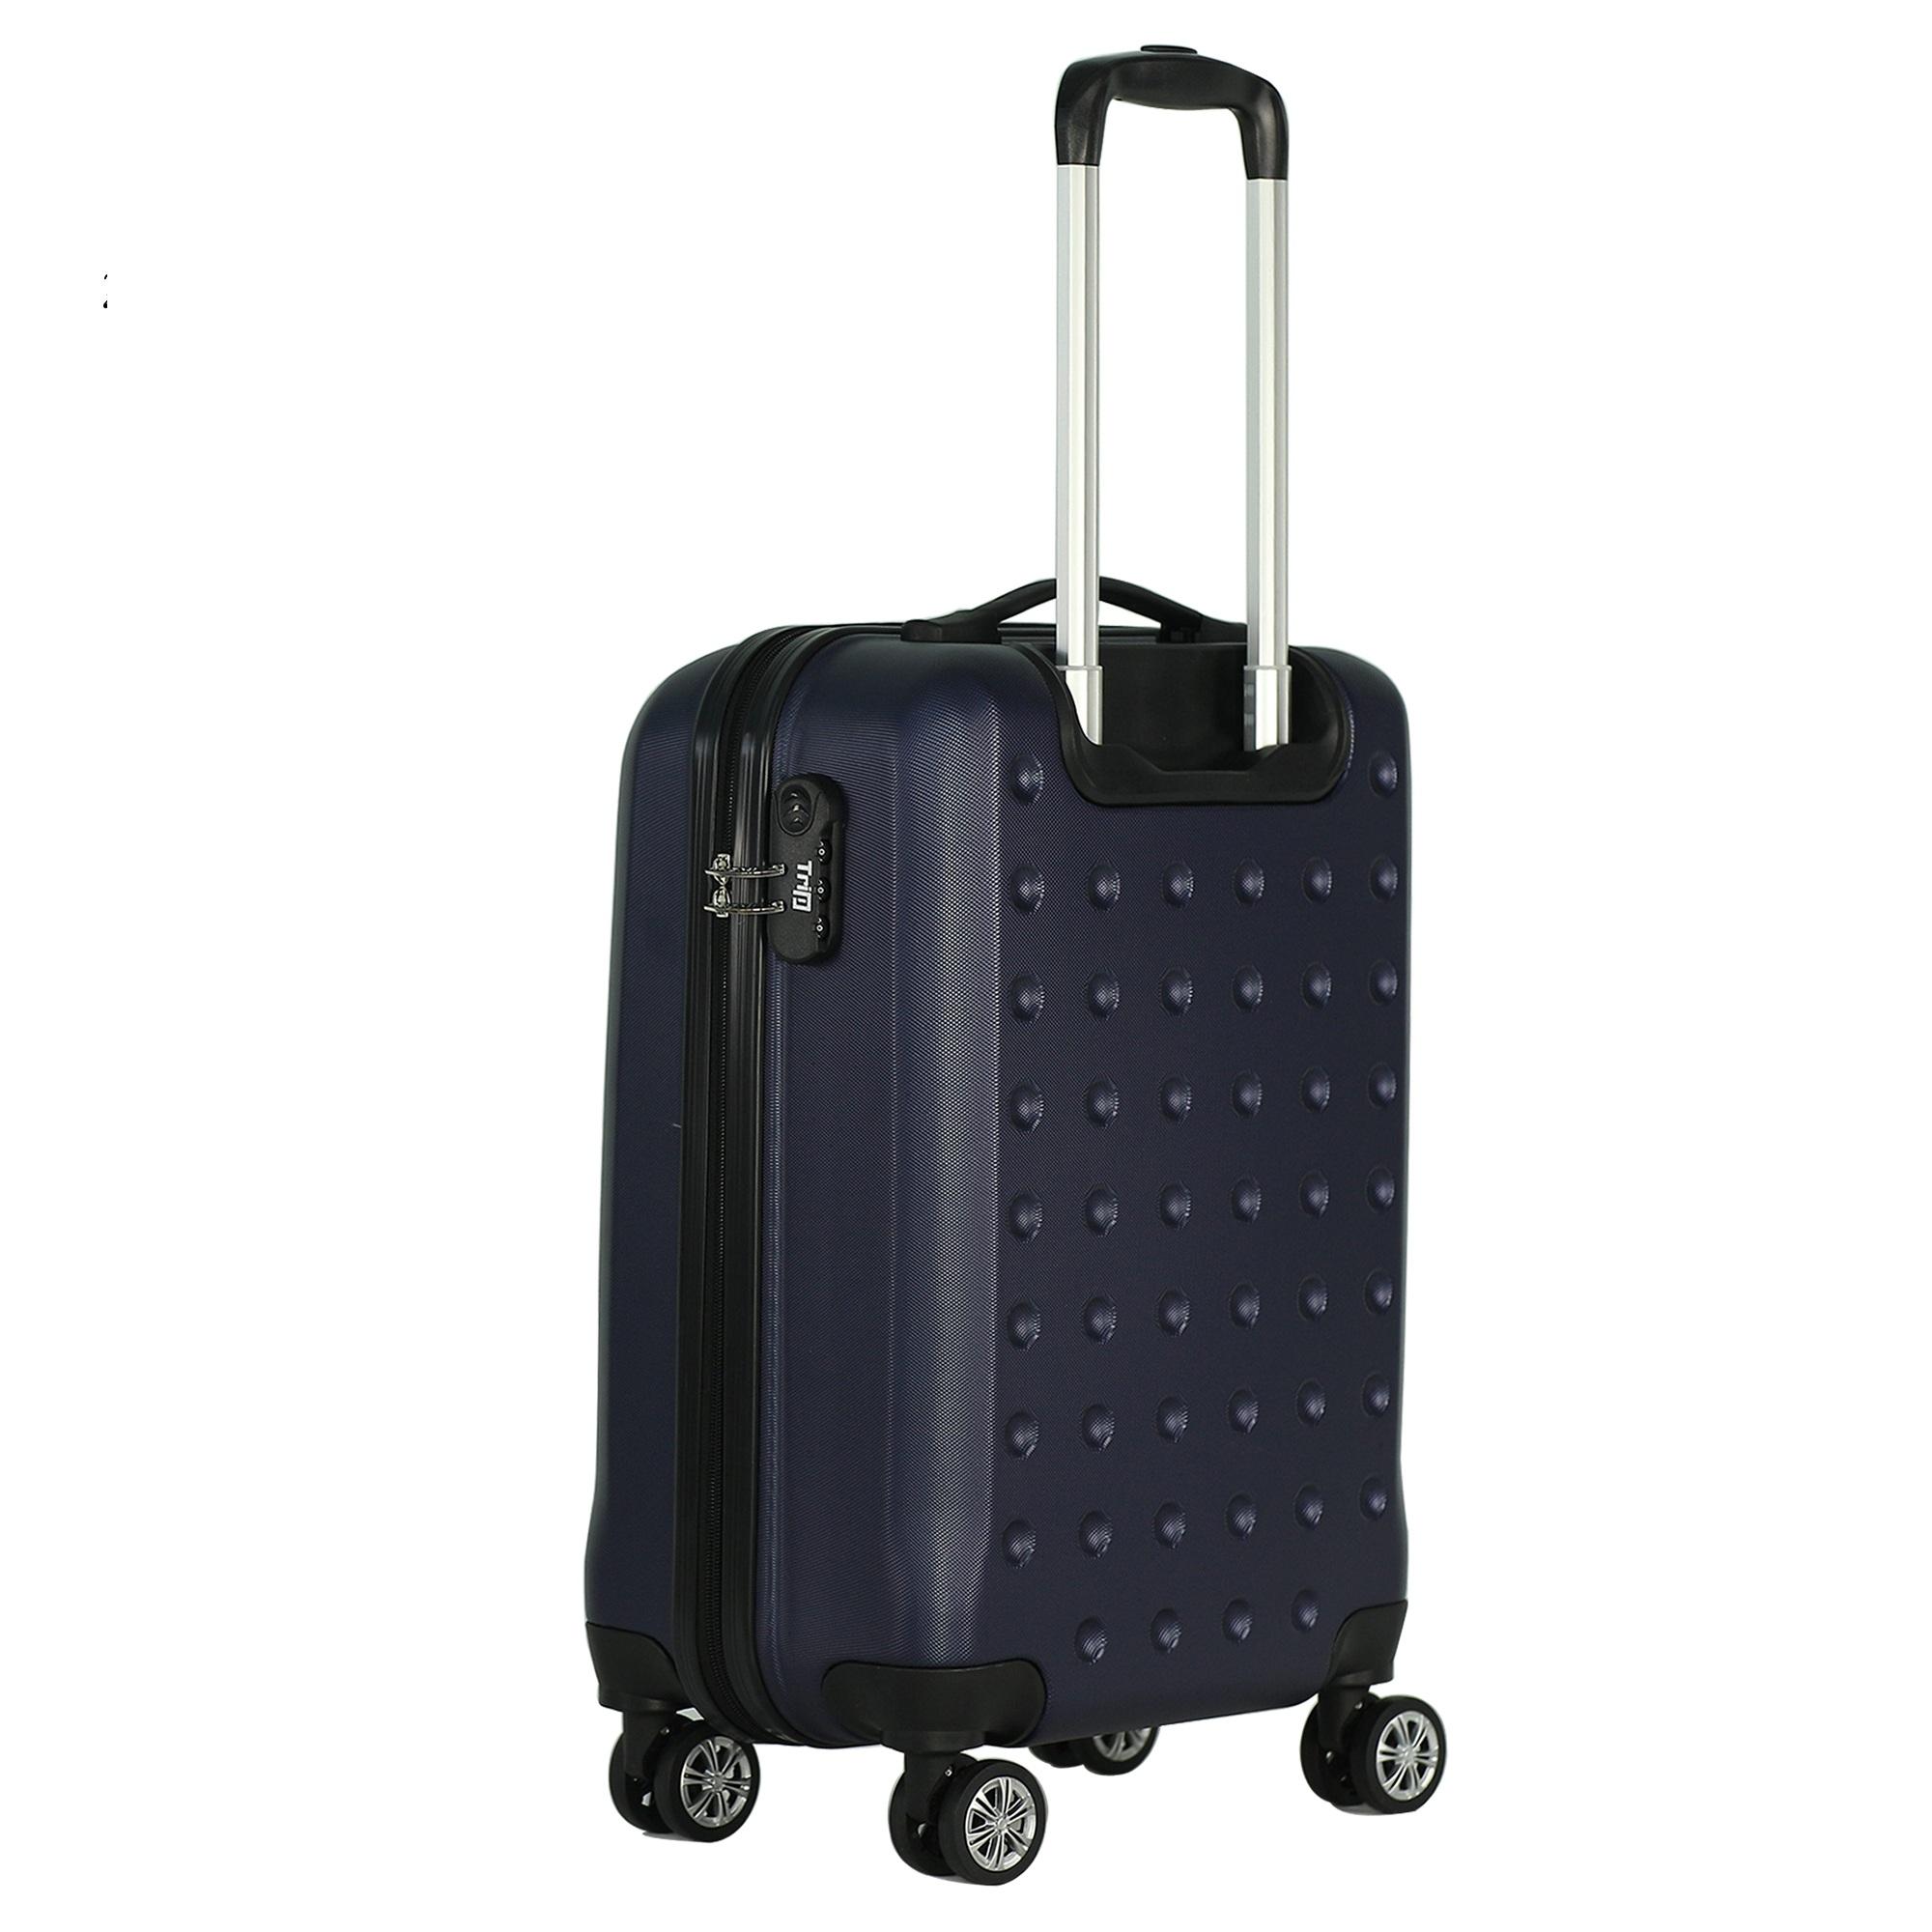 Vali Trip P13 size 50cm (20 inches) xanh đen